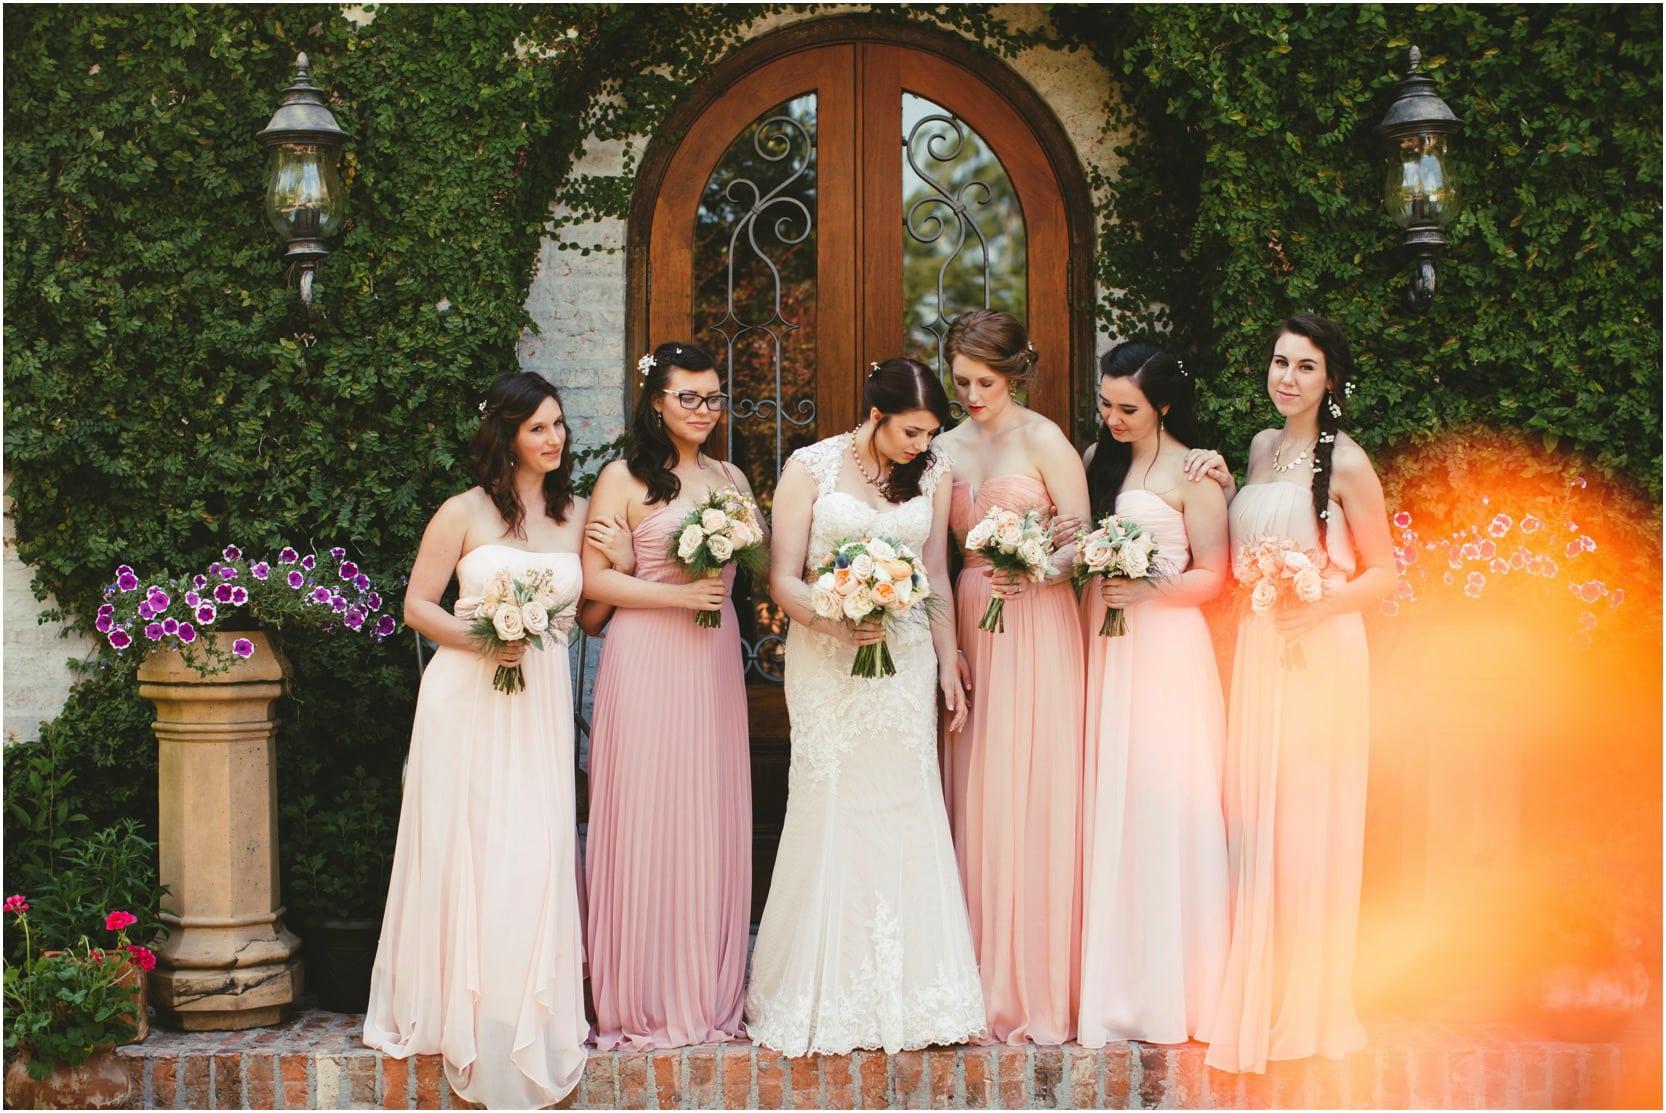 naomijacob_covington_wedding__118_blogstomped